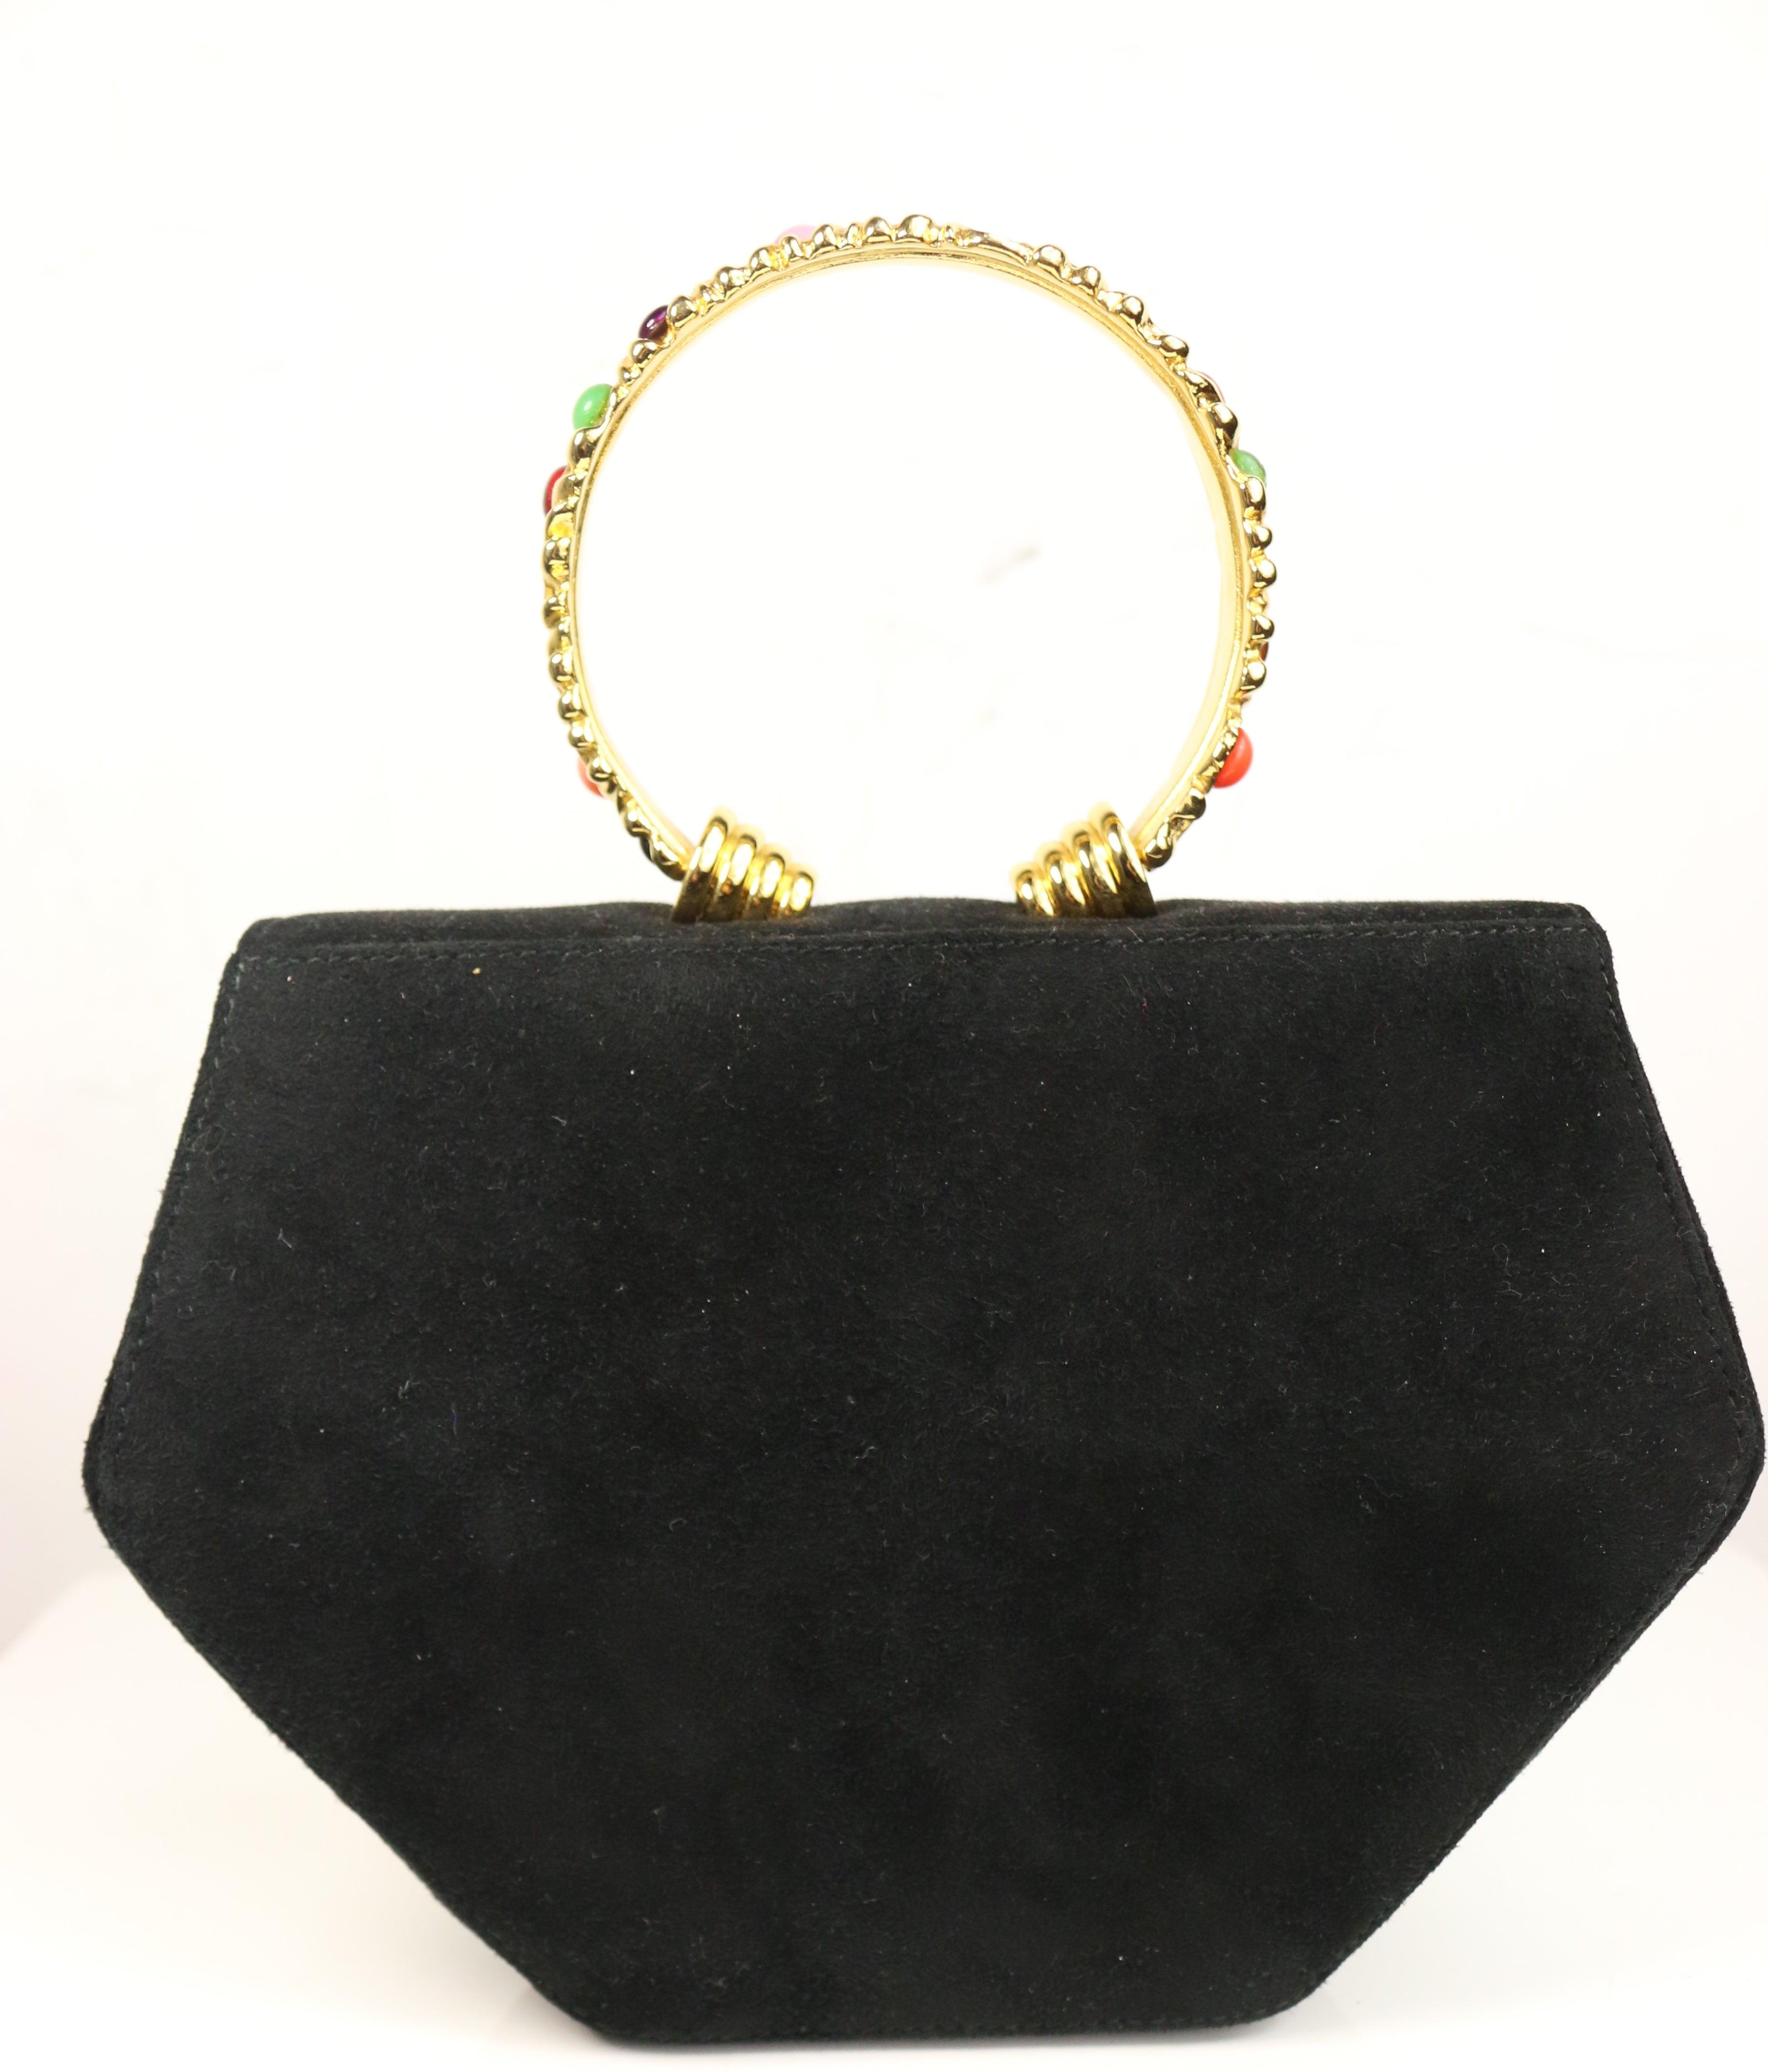 d4e9b3a3 Rodo Black Suede Gold Toned Handle with Colour Stones Octagon Shoulder Bag